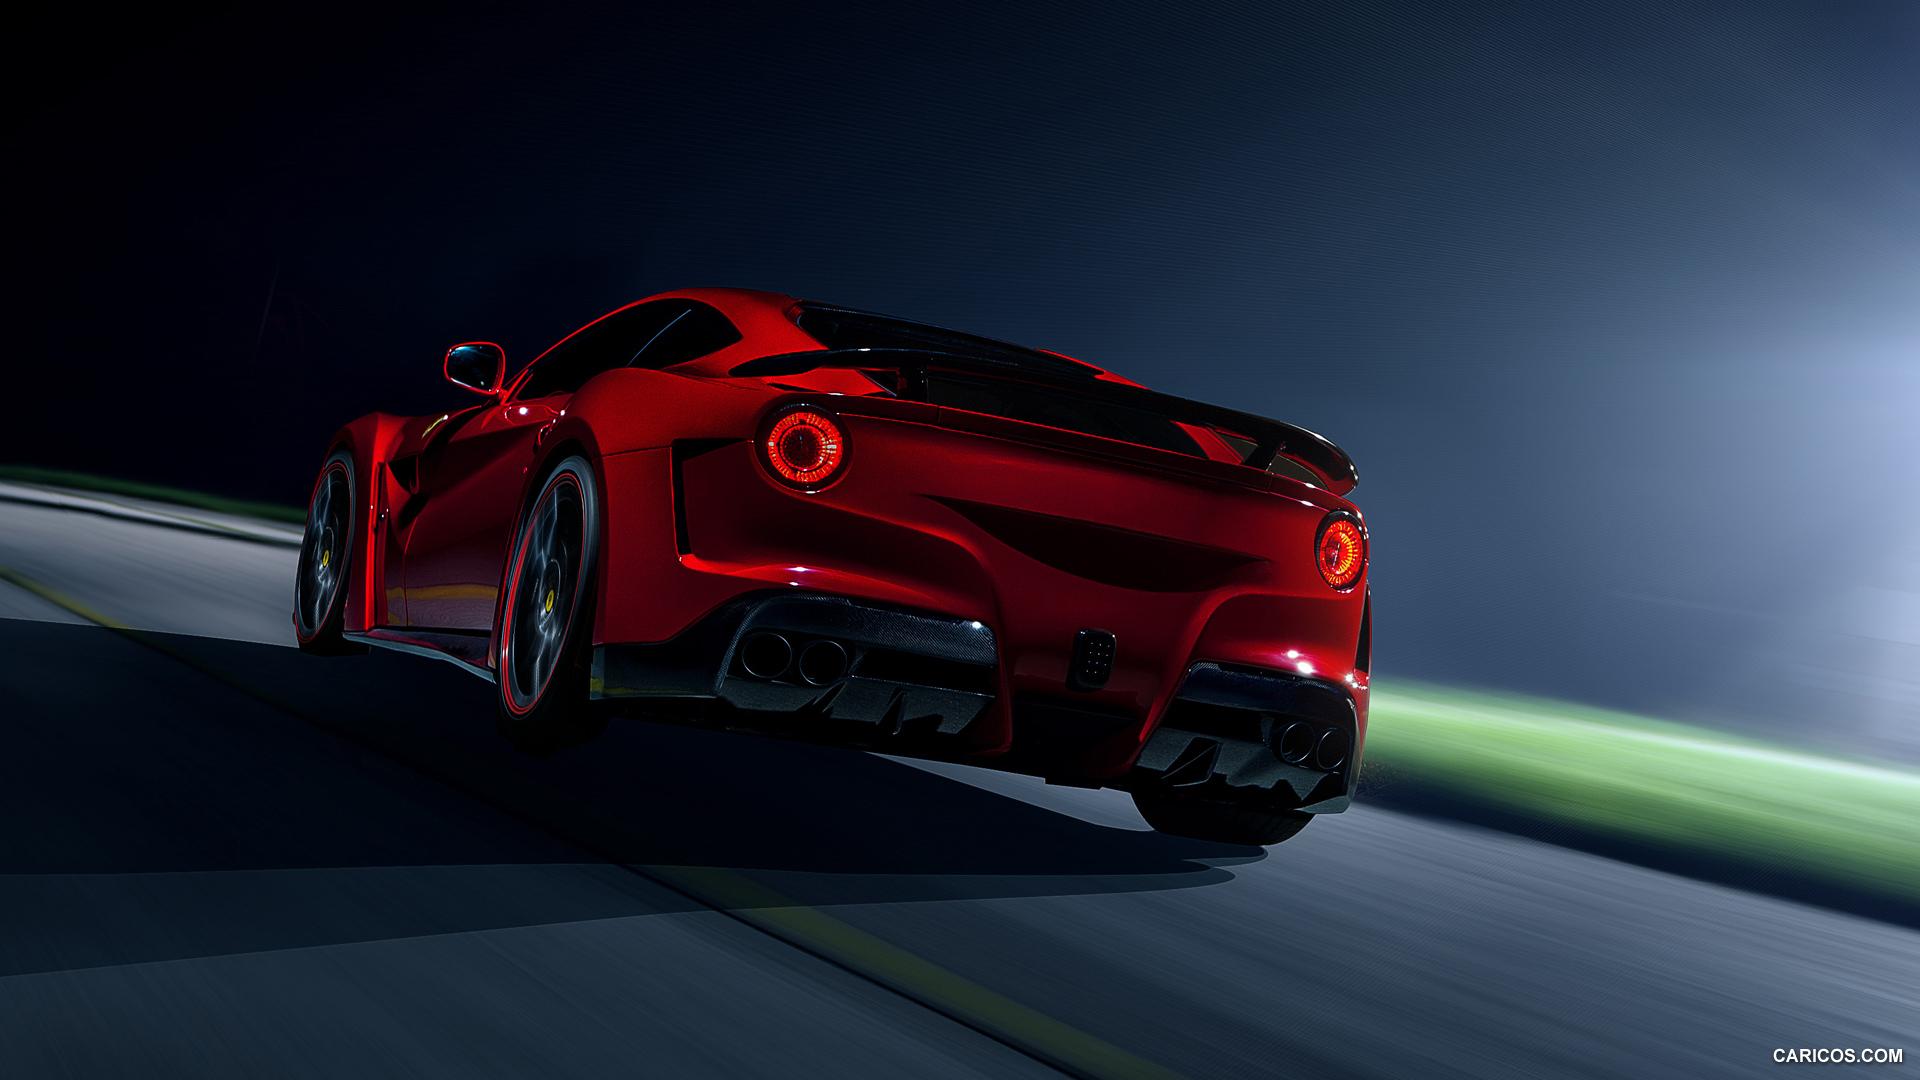 2014 NOVITEC ROSSO N LARGO Ferrari F12berlinetta   Rear HD 1920x1080